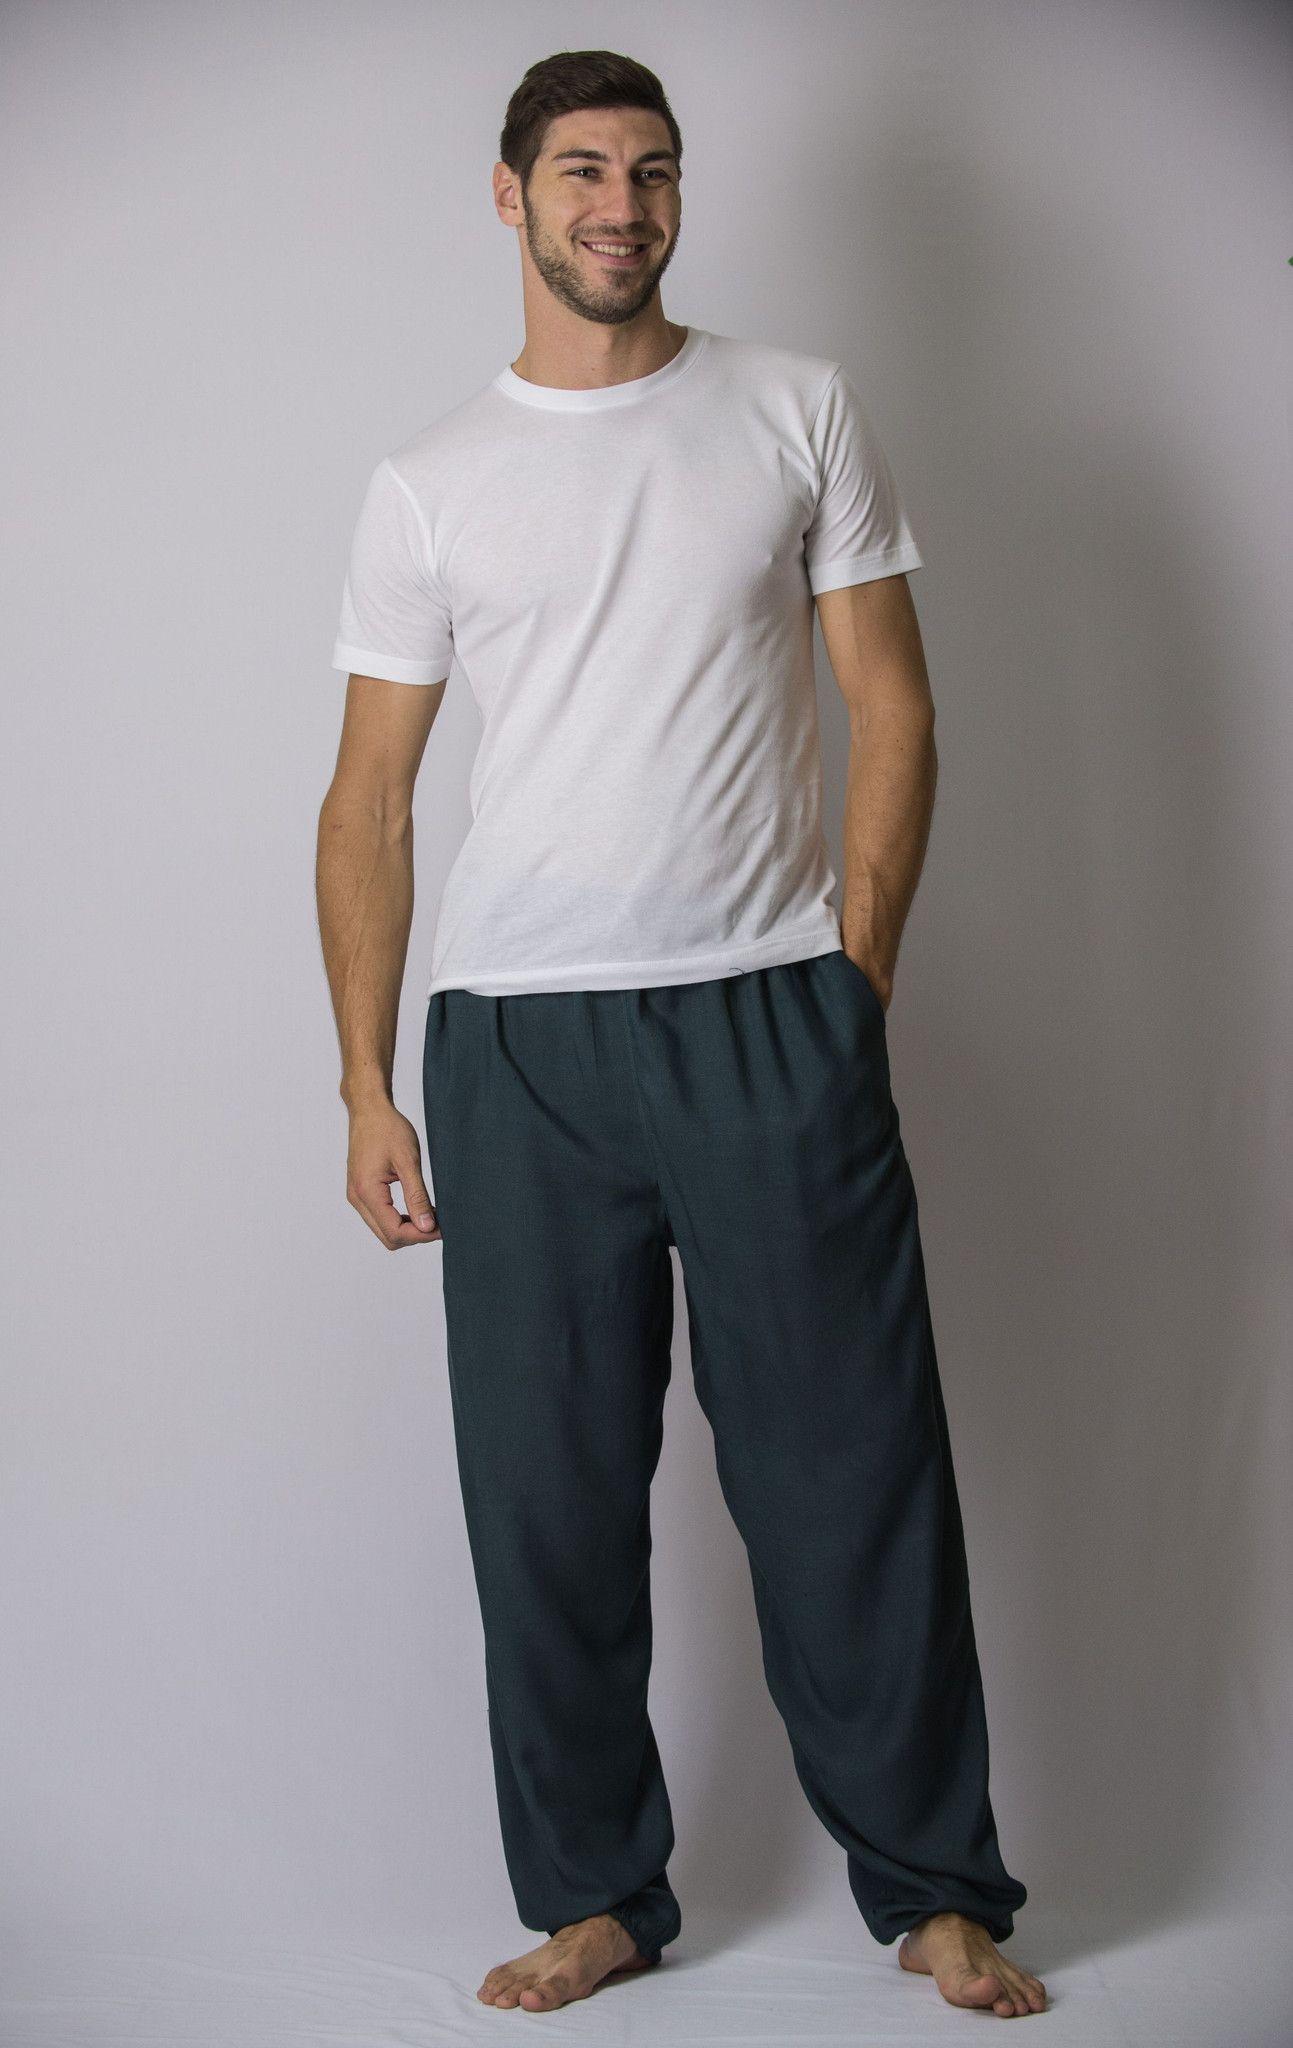 f8168ea881dd1d Solid Color Drawstring Men's Yoga Massage Pants in Dark Teal – Harem Pants  ✖️More Pins Like This One At FOSTERGINGER @ Pinterest✖️